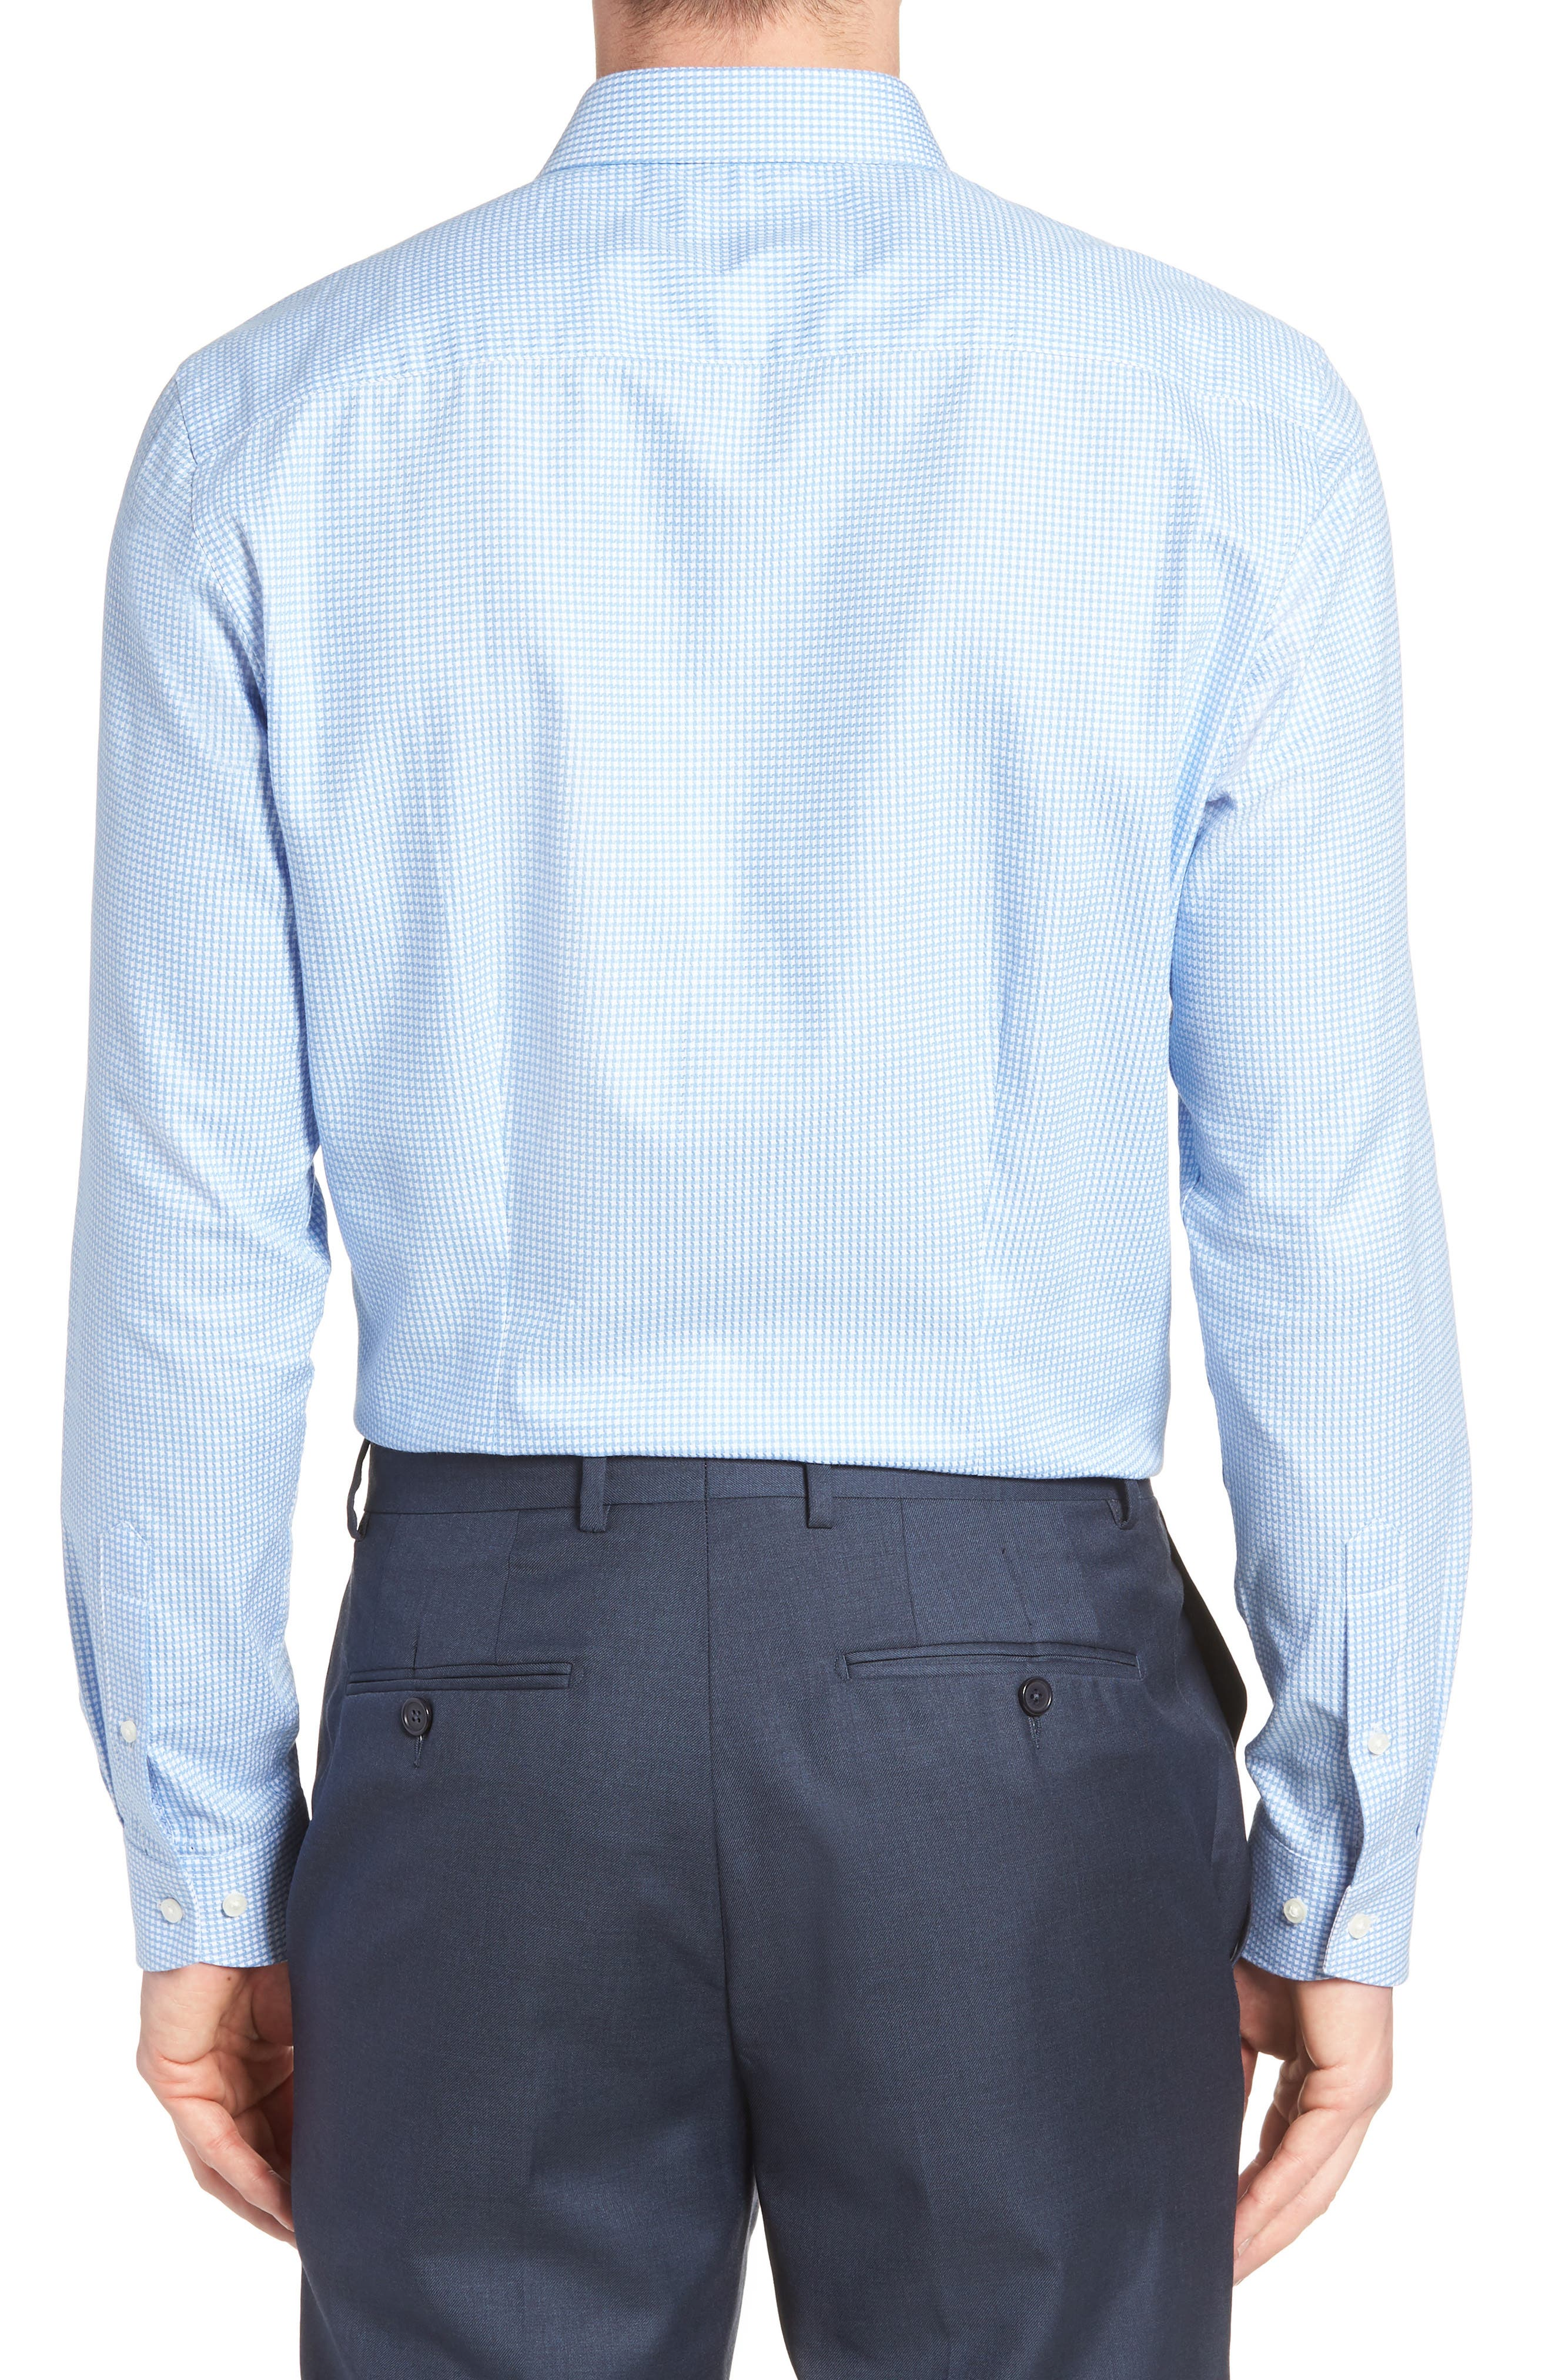 Jaiden Trim Fit Houndstooth Dress Shirt,                             Alternate thumbnail 3, color,                             450